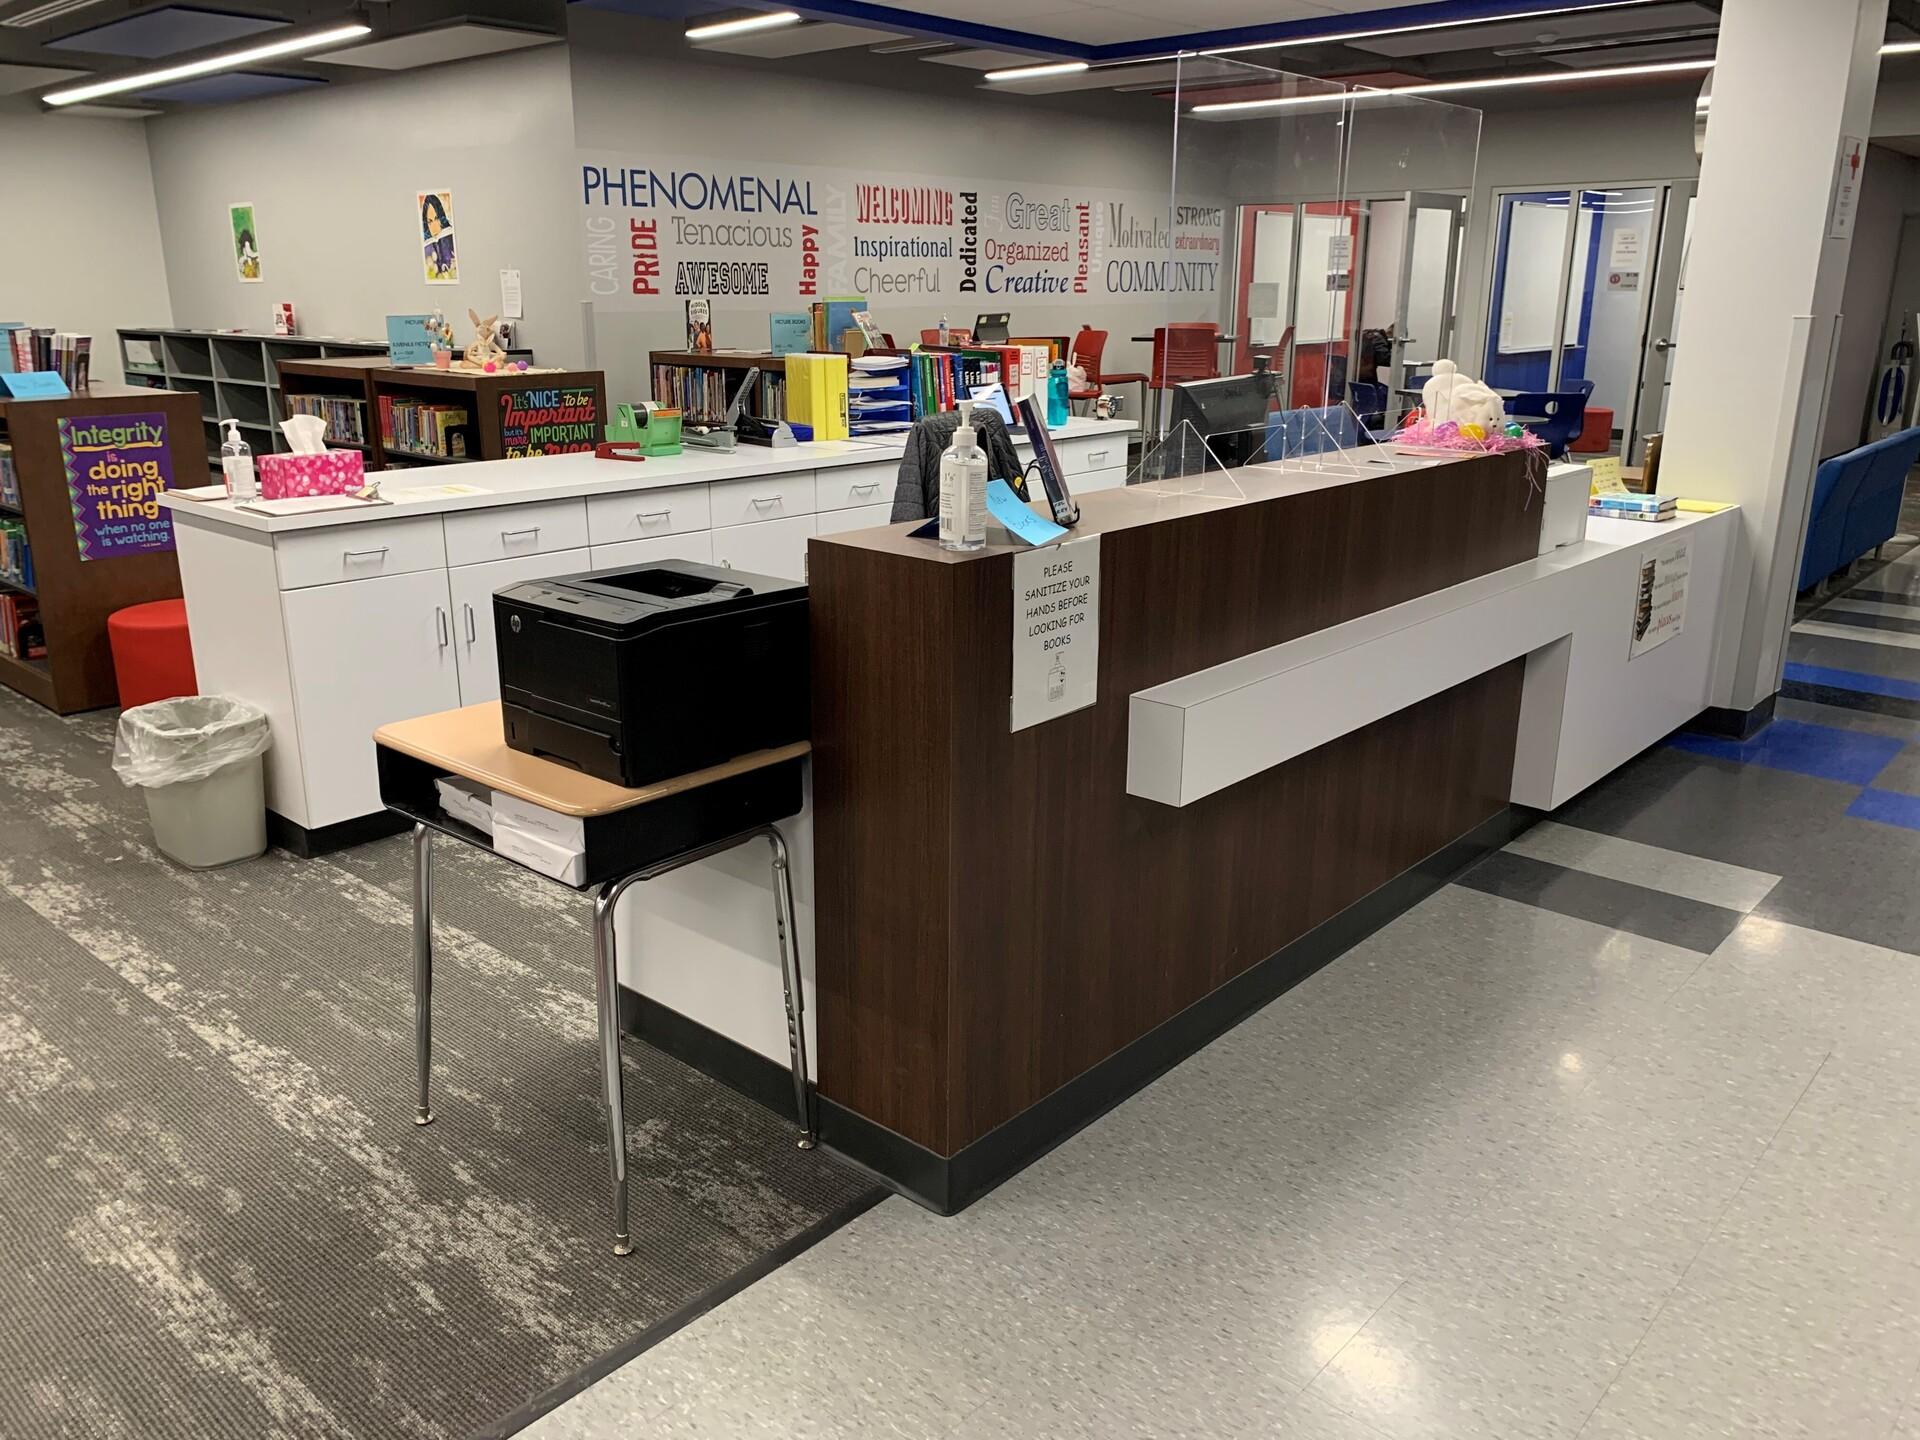 southland-library-dras-cases-custom-desk-1920x1920